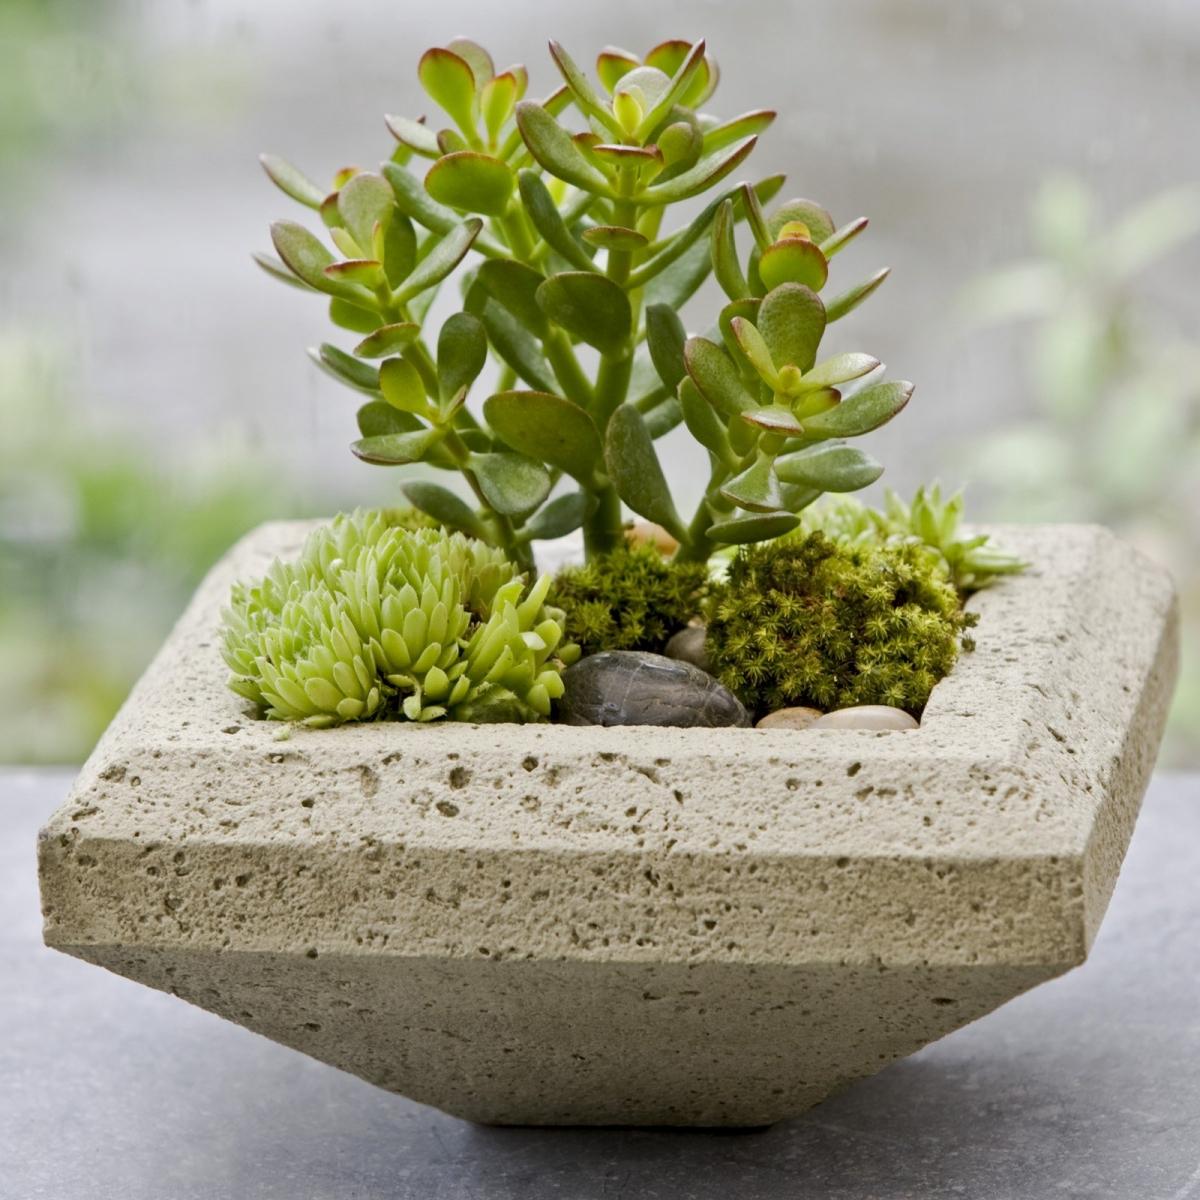 Shop this look: Campania-International-Ada-Cast-Stone-Planter